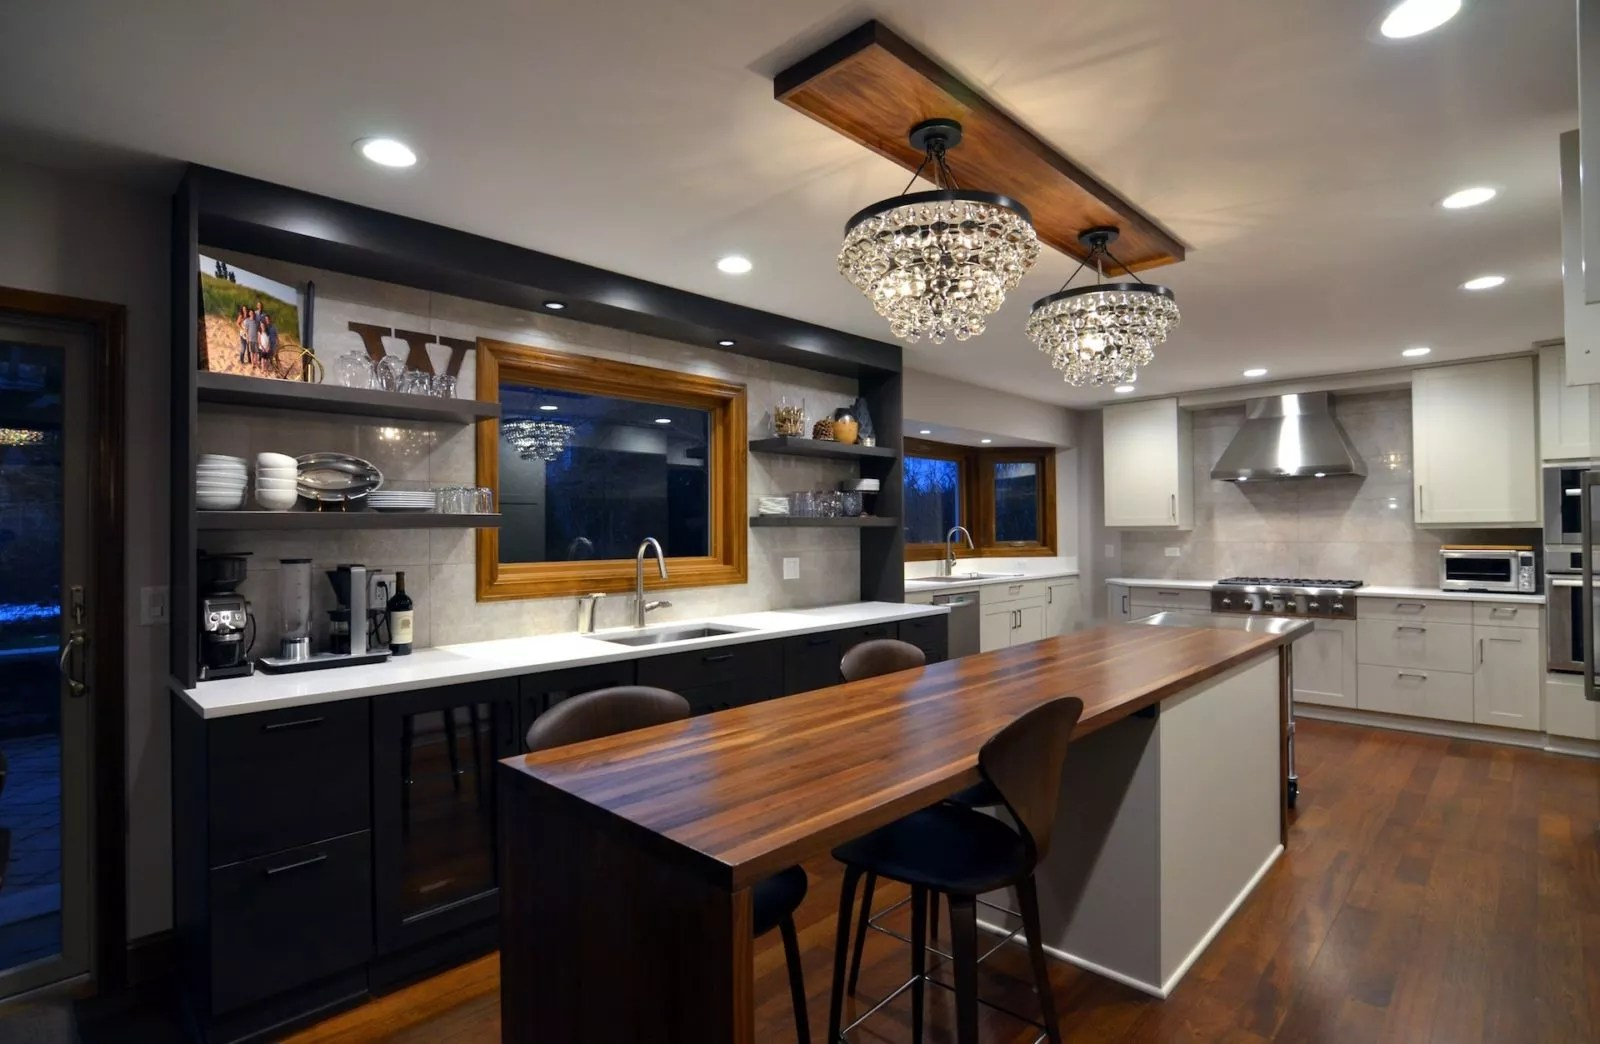 Kitchen Remodeling and Renovation  Kitchen Renovation